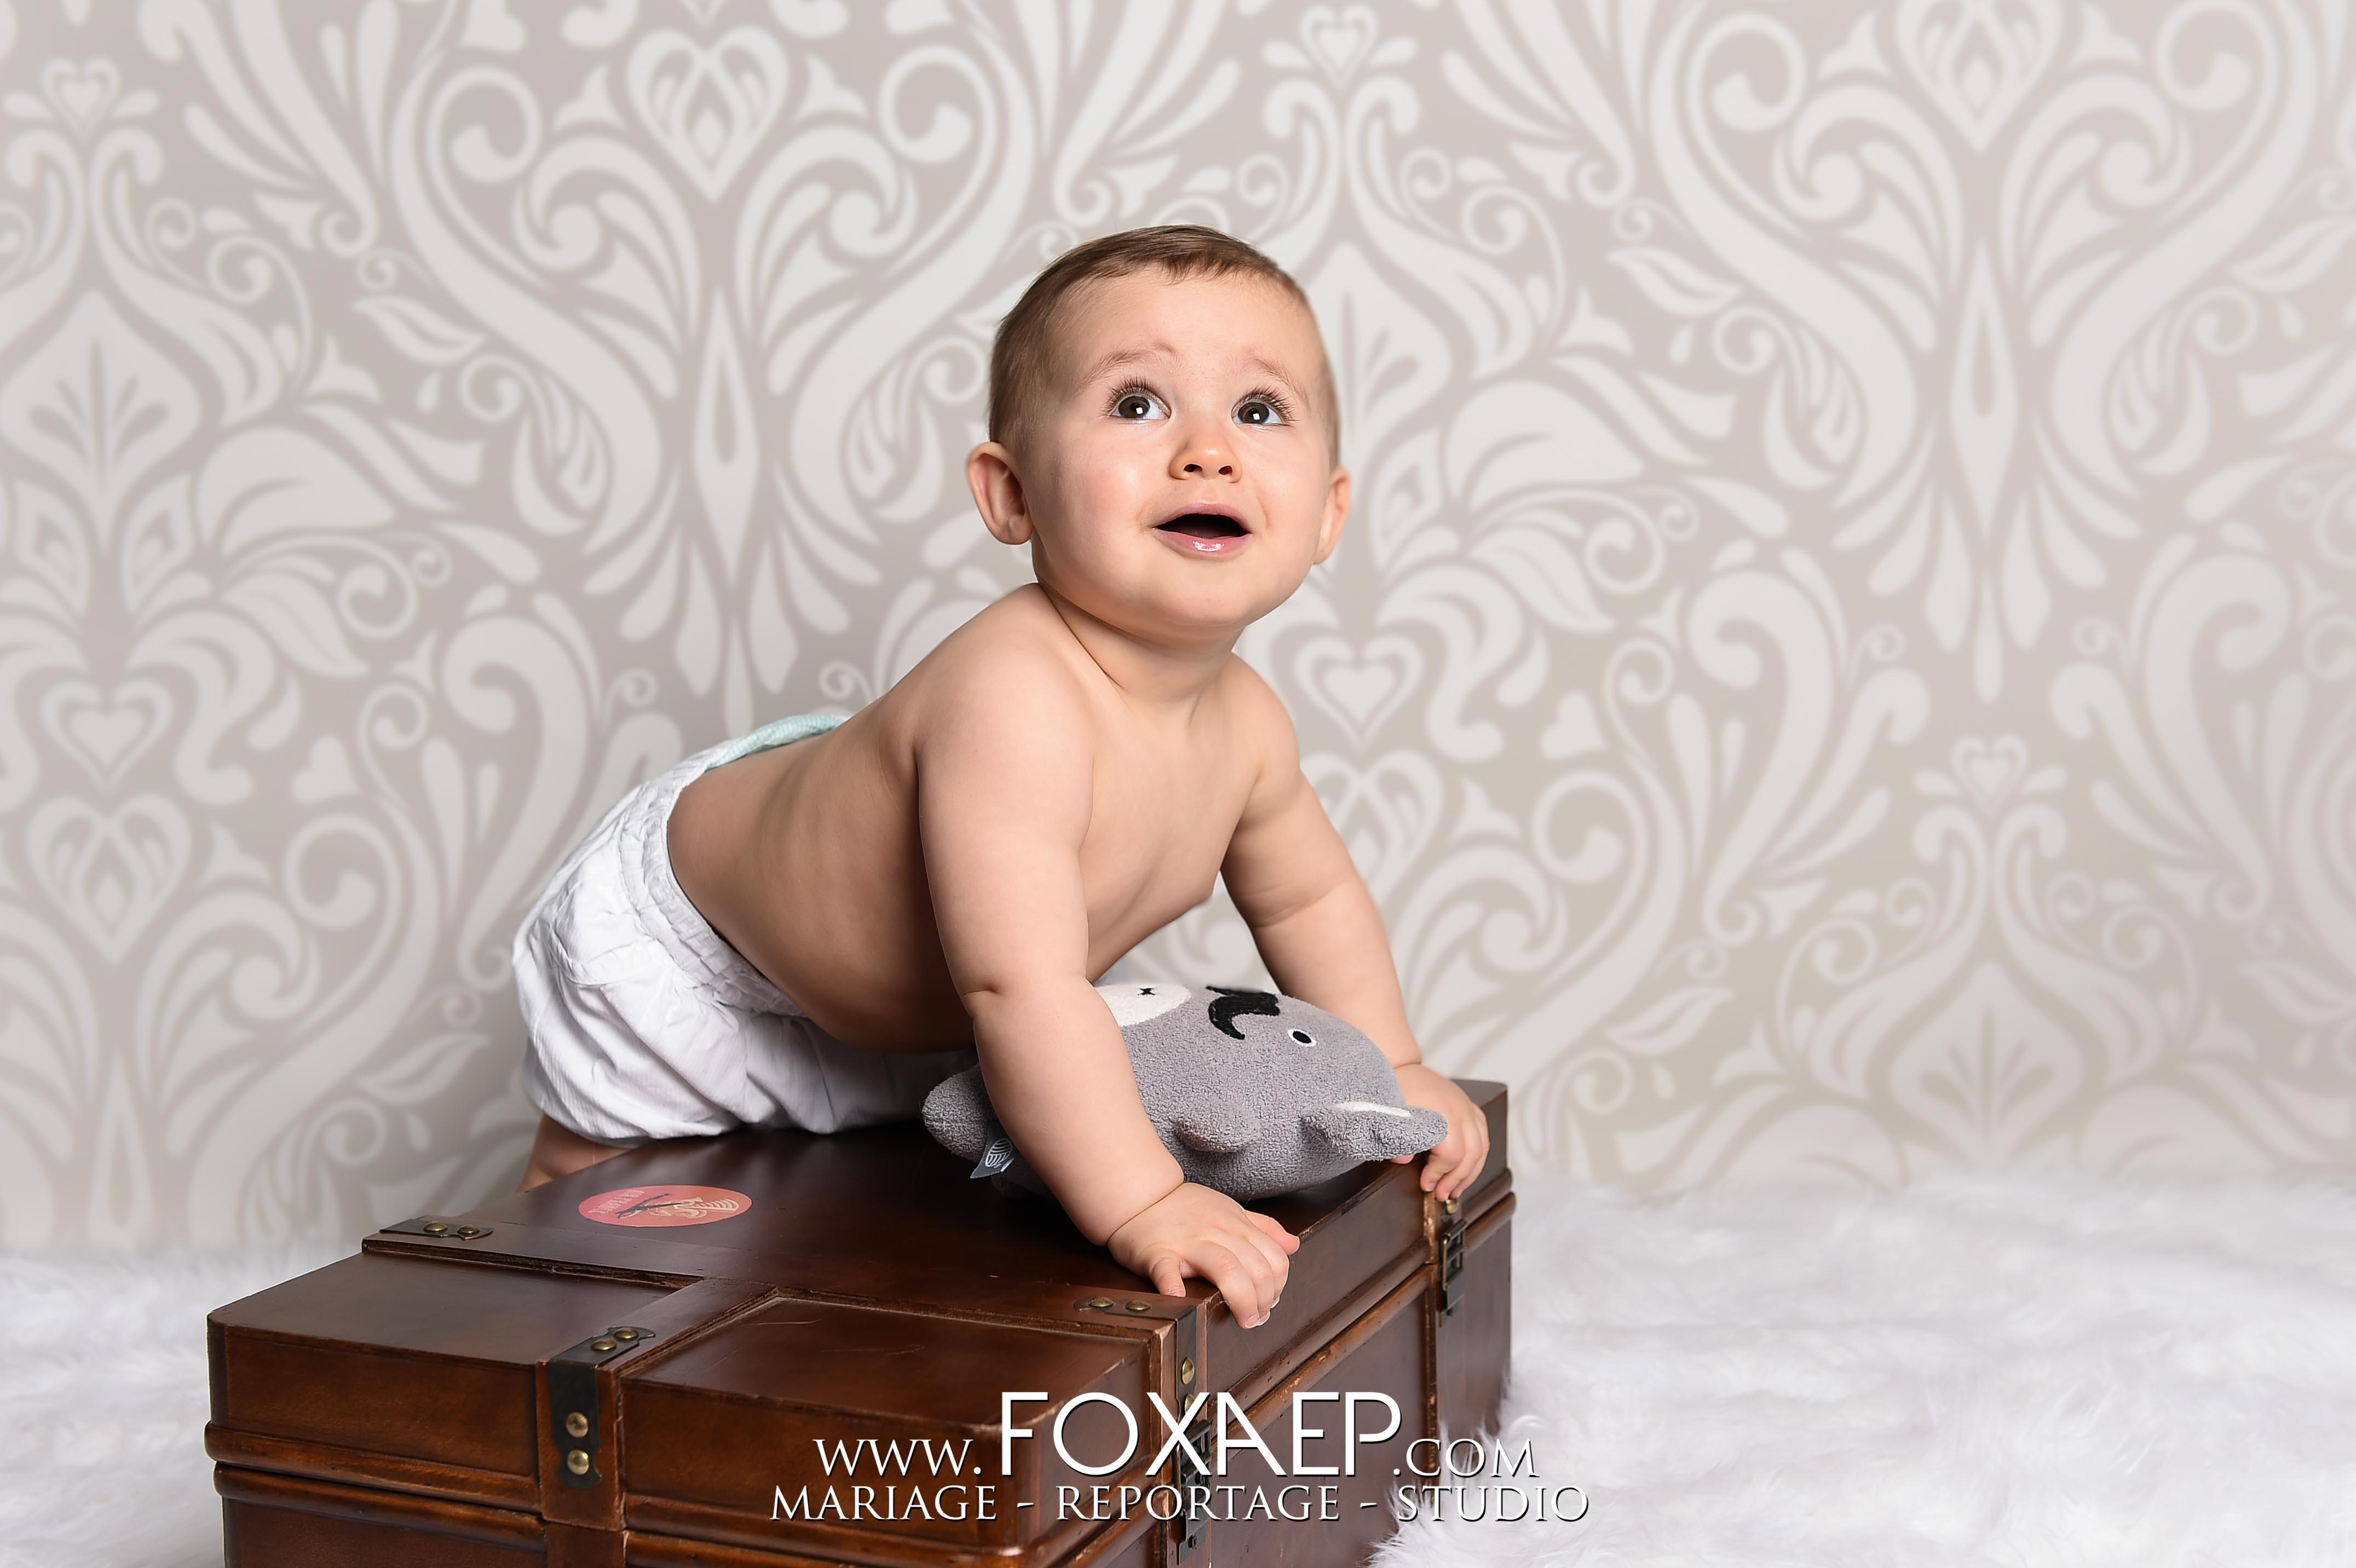 photographe bebe dijon naissance dole louhans chalon sur saone macon mariage nouveau n - Photographe Mariage Chalon Sur Saone